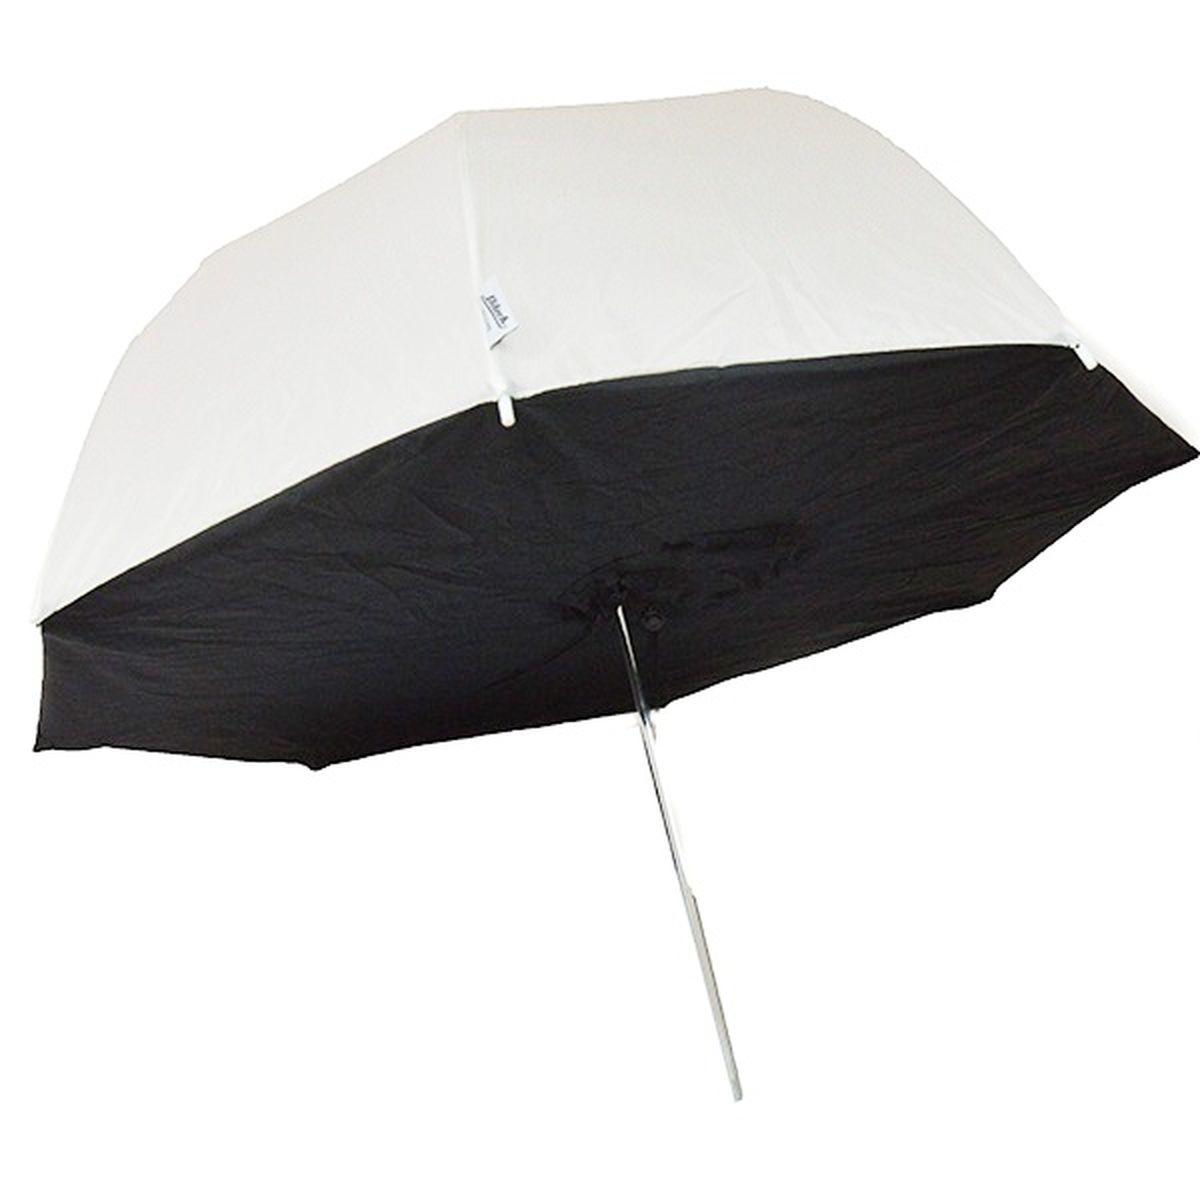 Ditech UBS33WB, White Black зонт-софтбокс для фотосъемки